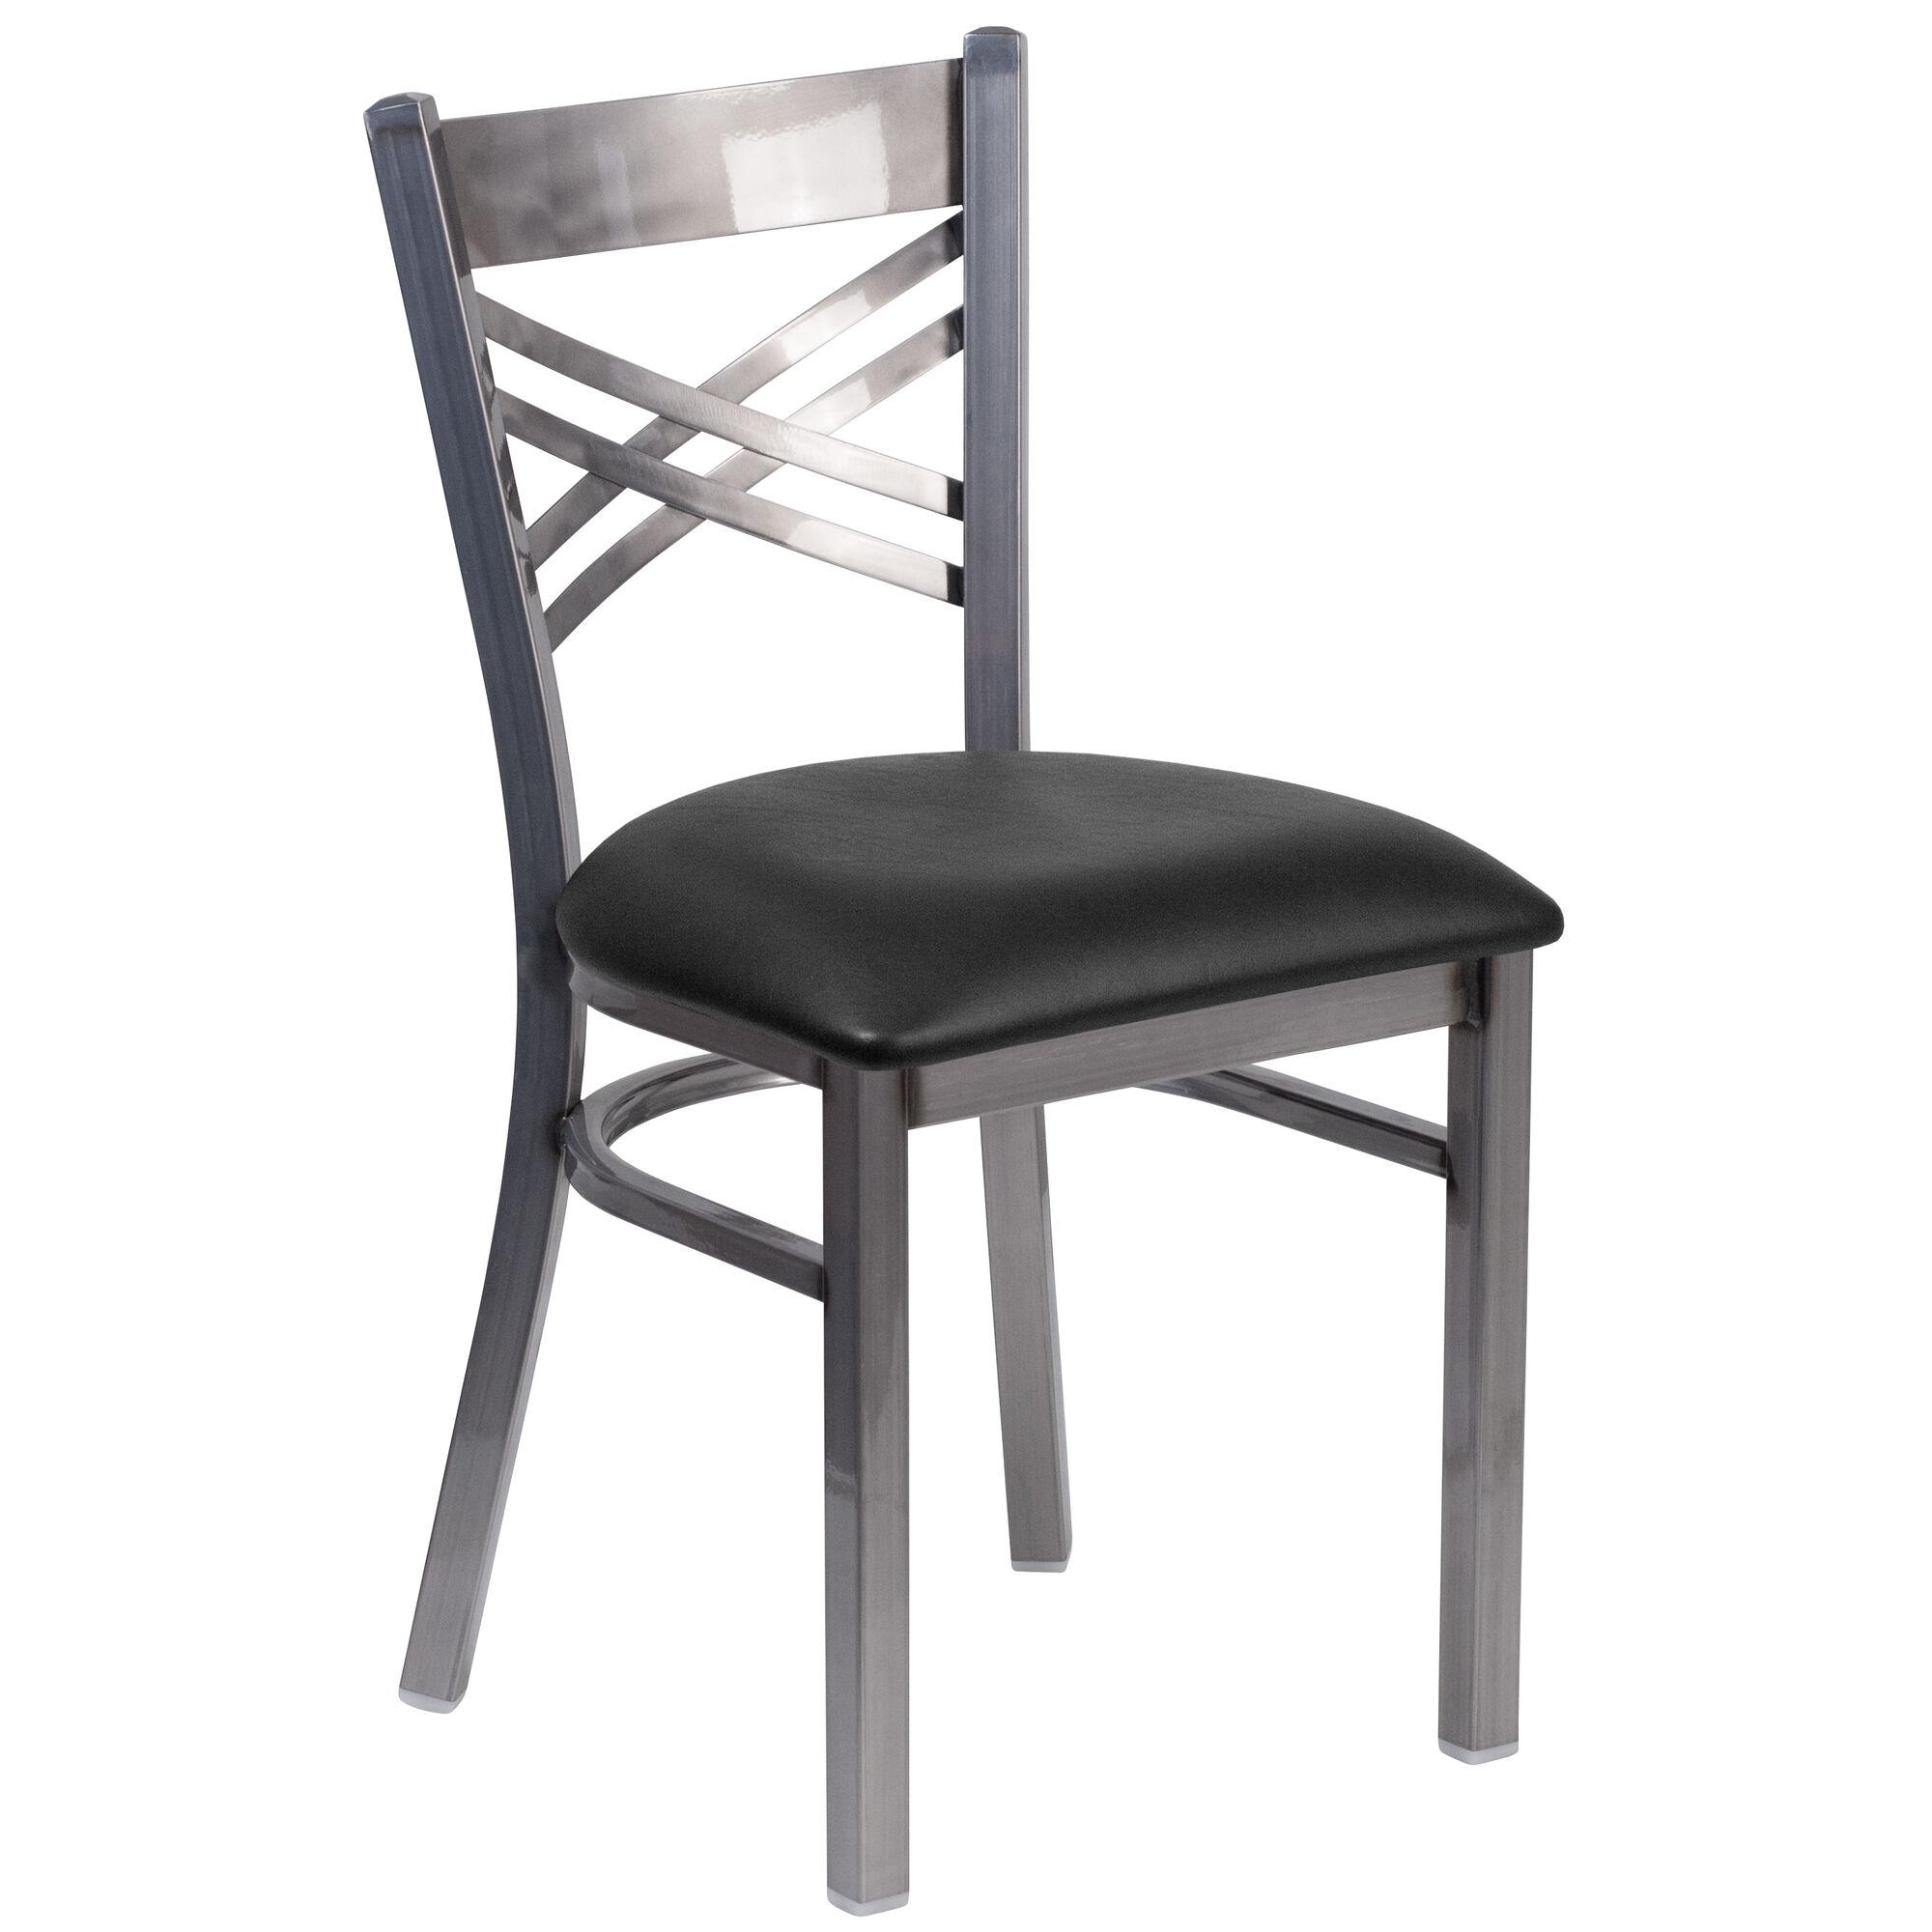 Clear chair black seat bfdh clrbk tdr